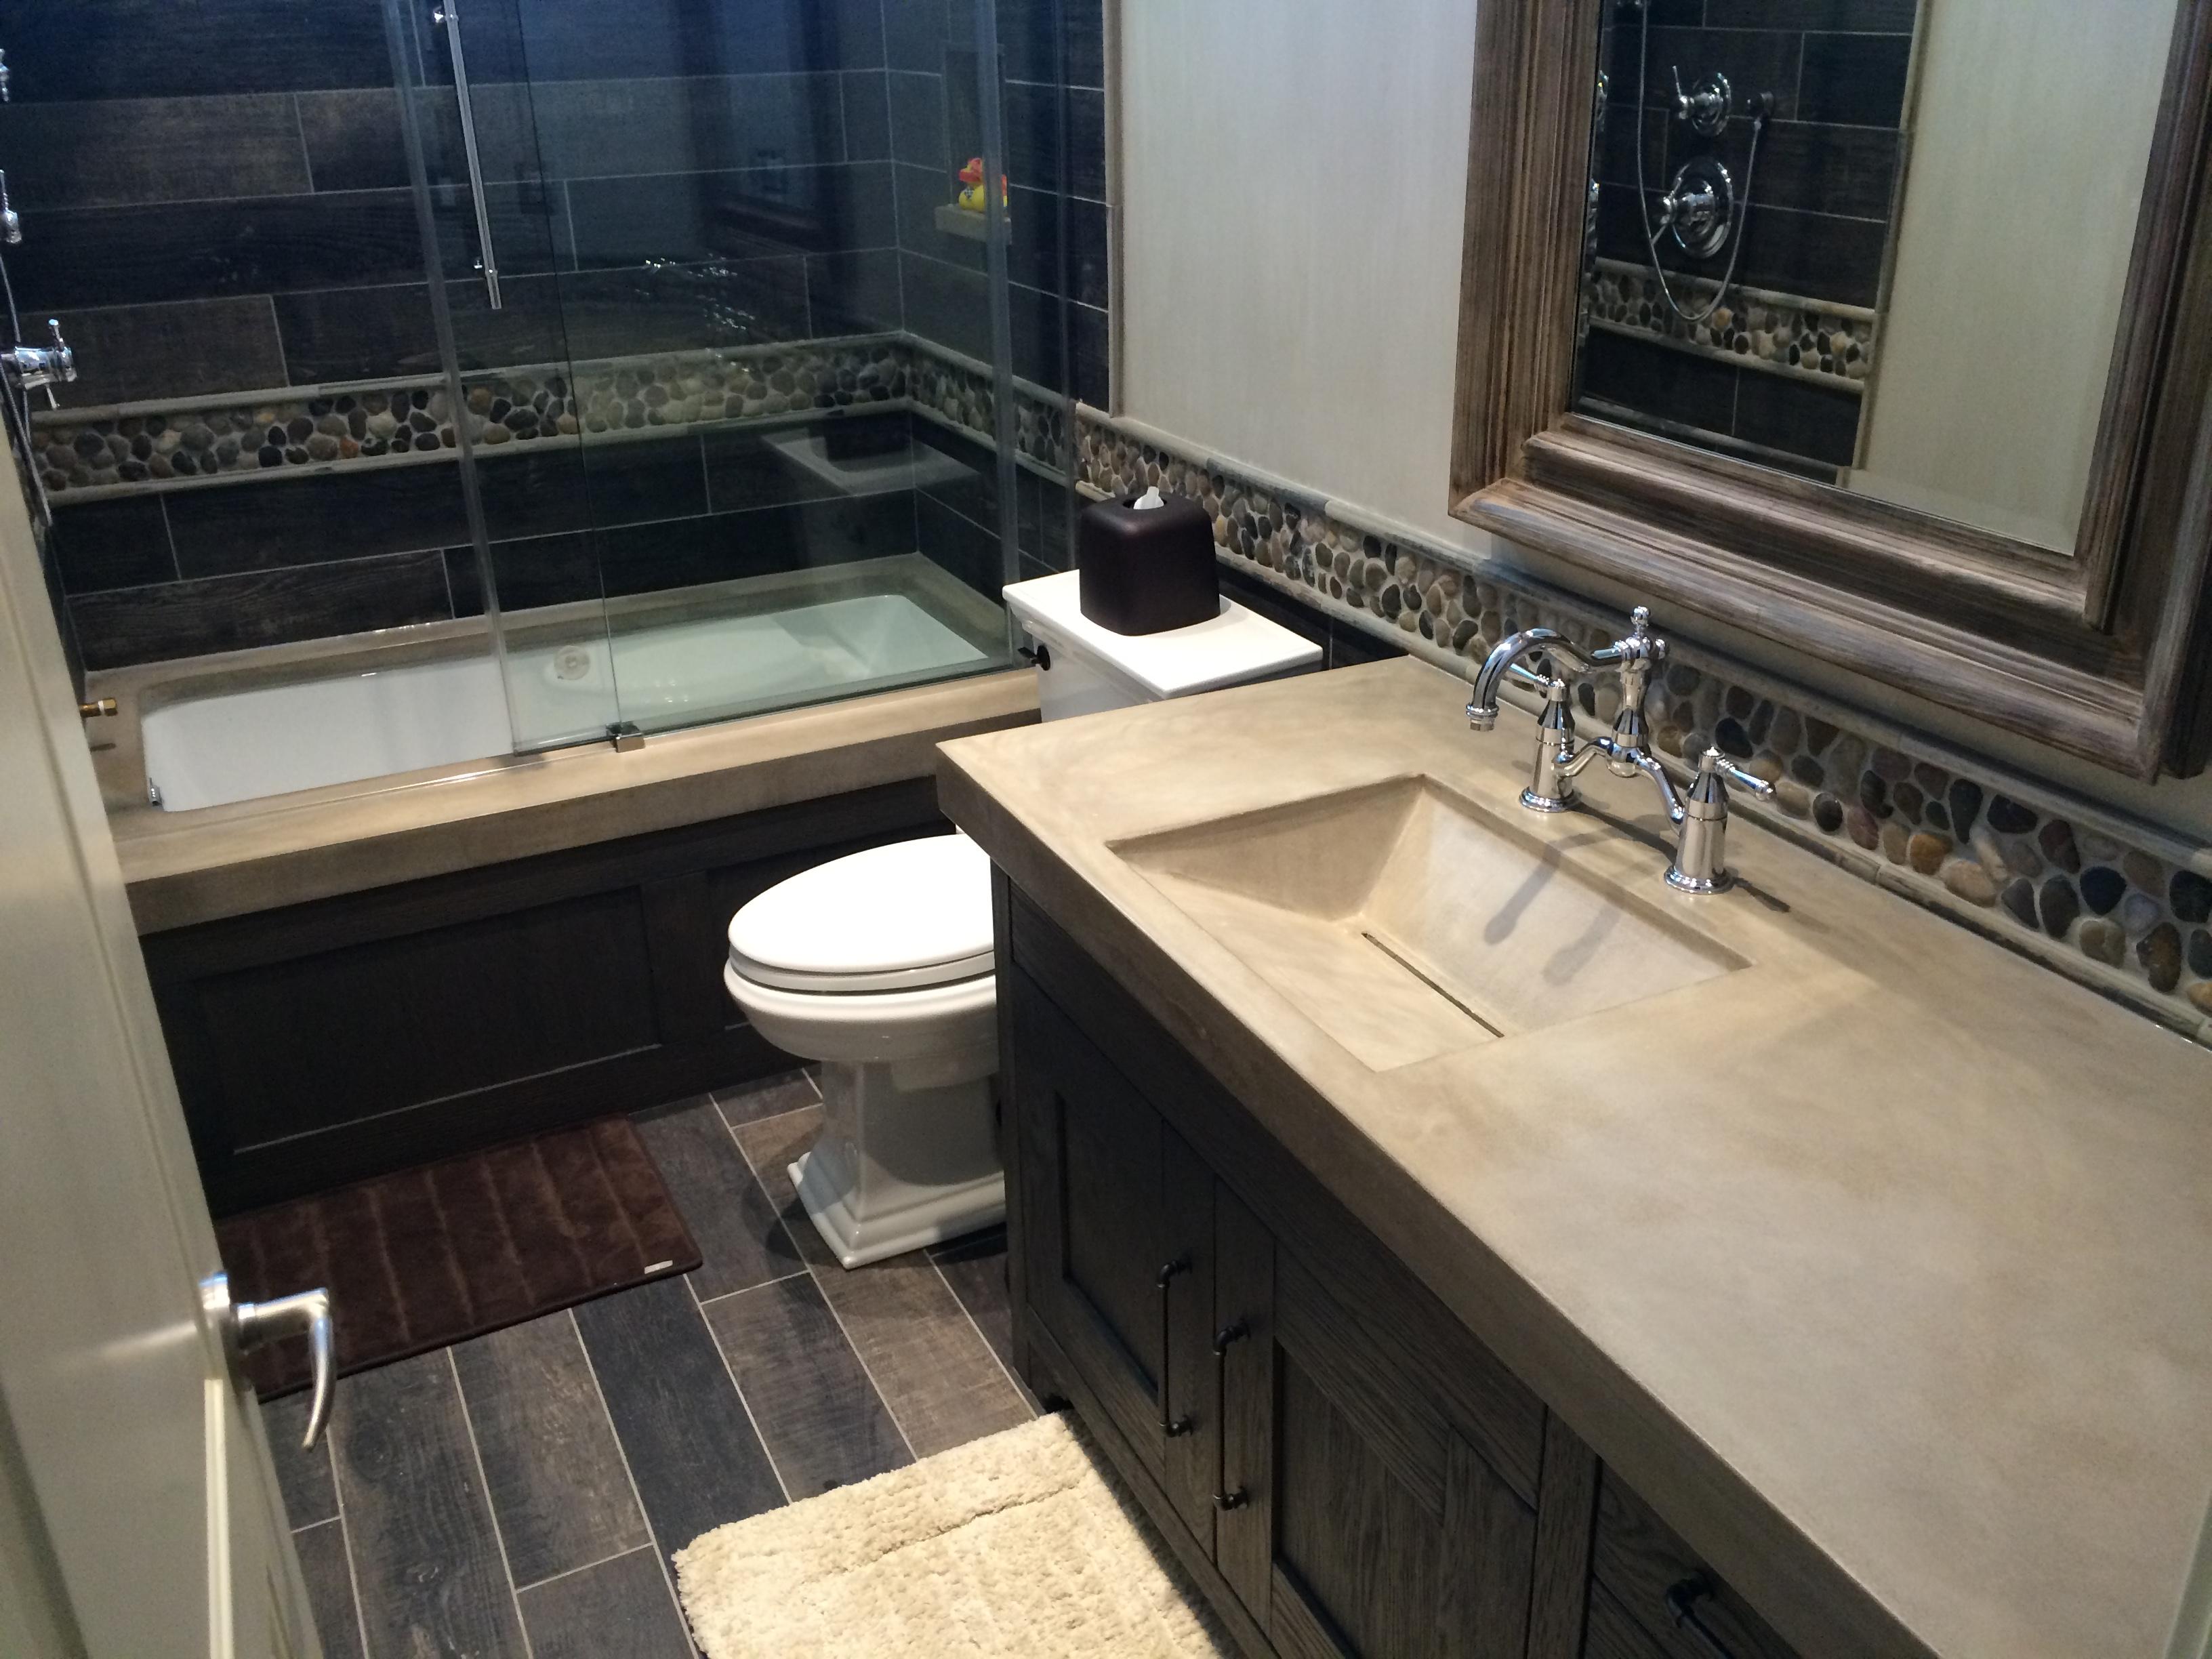 Bathroom Vanity and Tub Surround